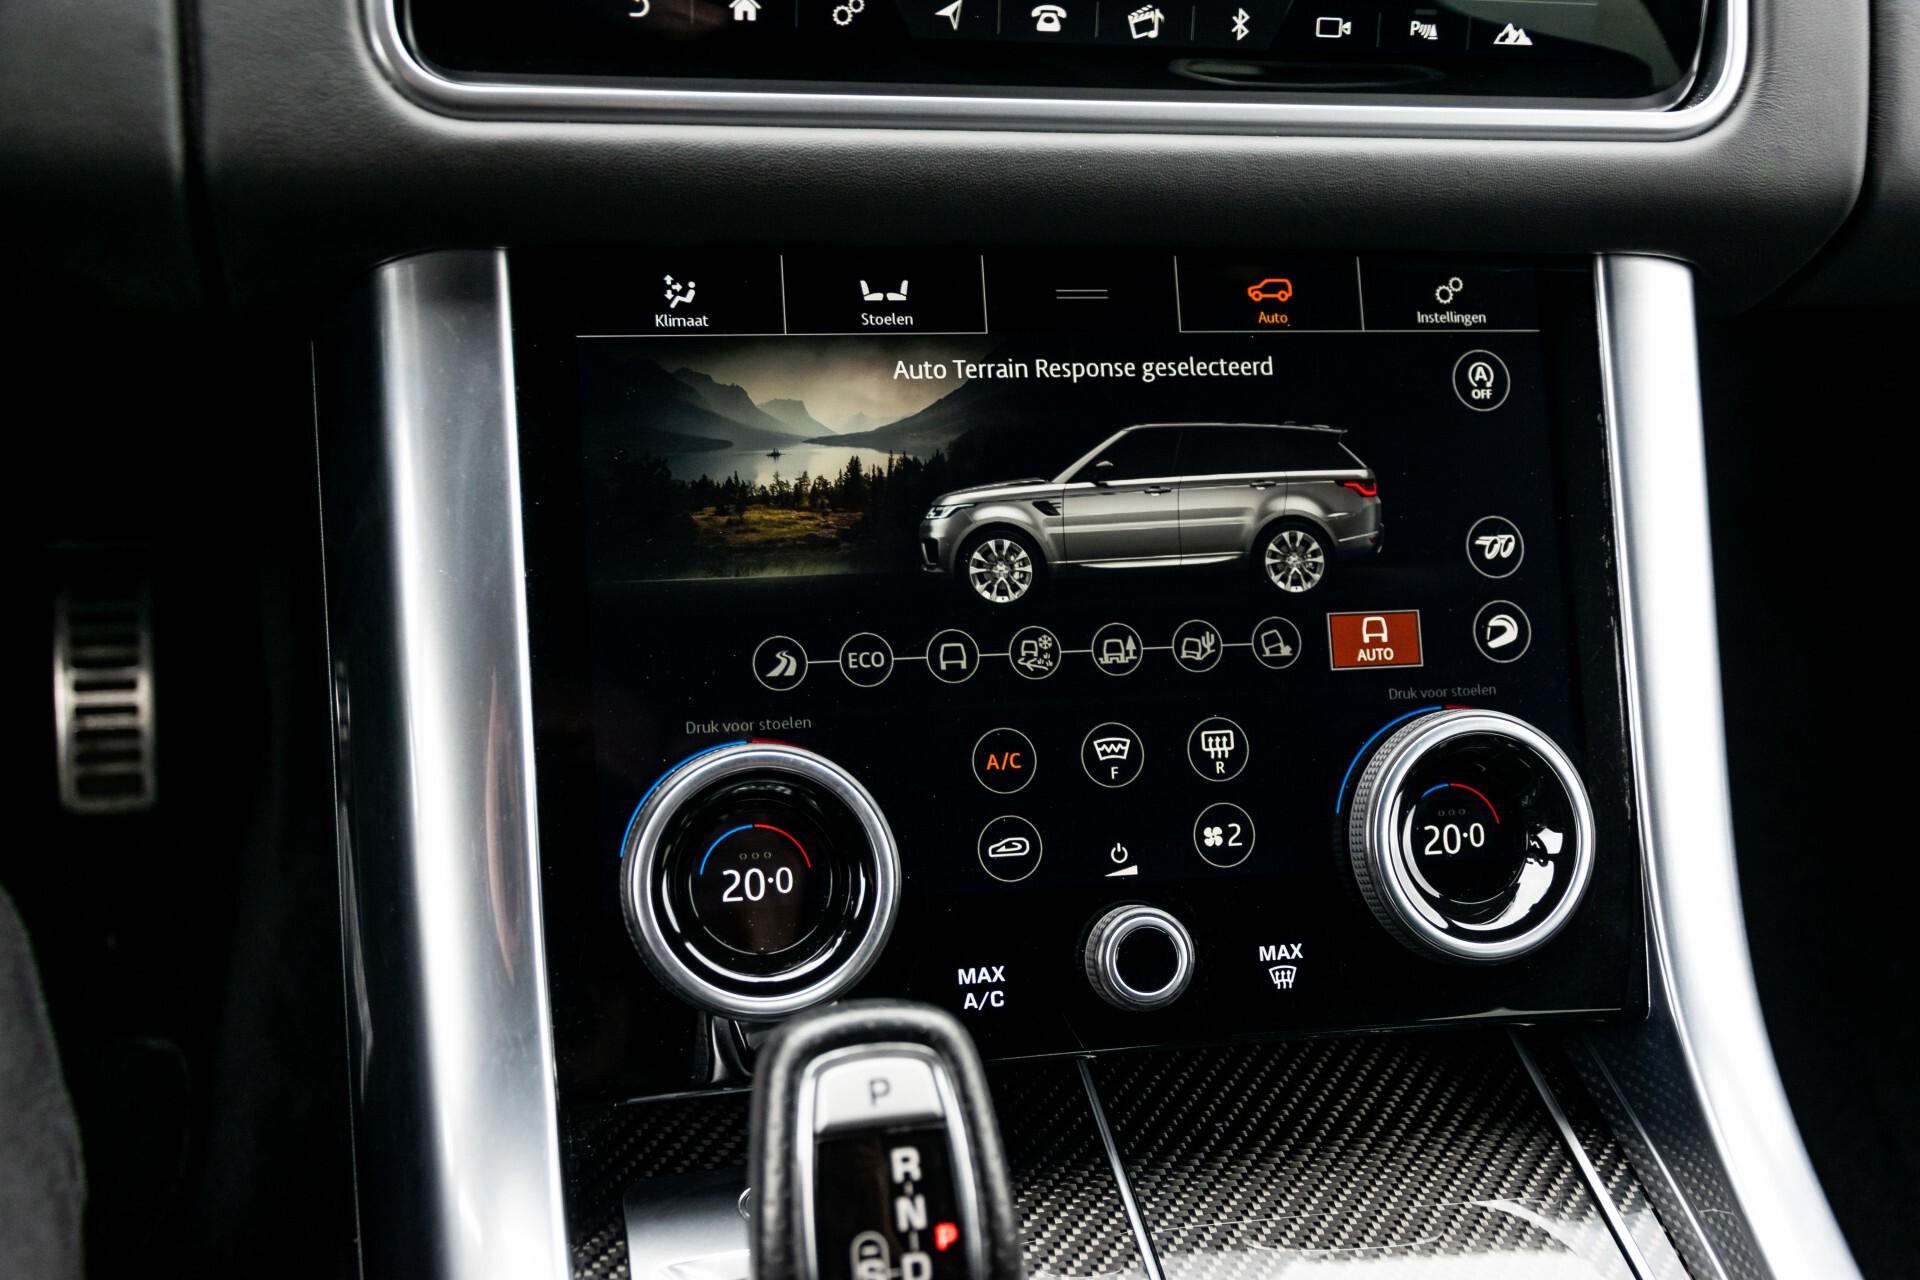 Land Rover Range Rover Sport SVR 5.0 Supercharged 575pk Full Carbon Nieuwprijs €241377 Foto 33